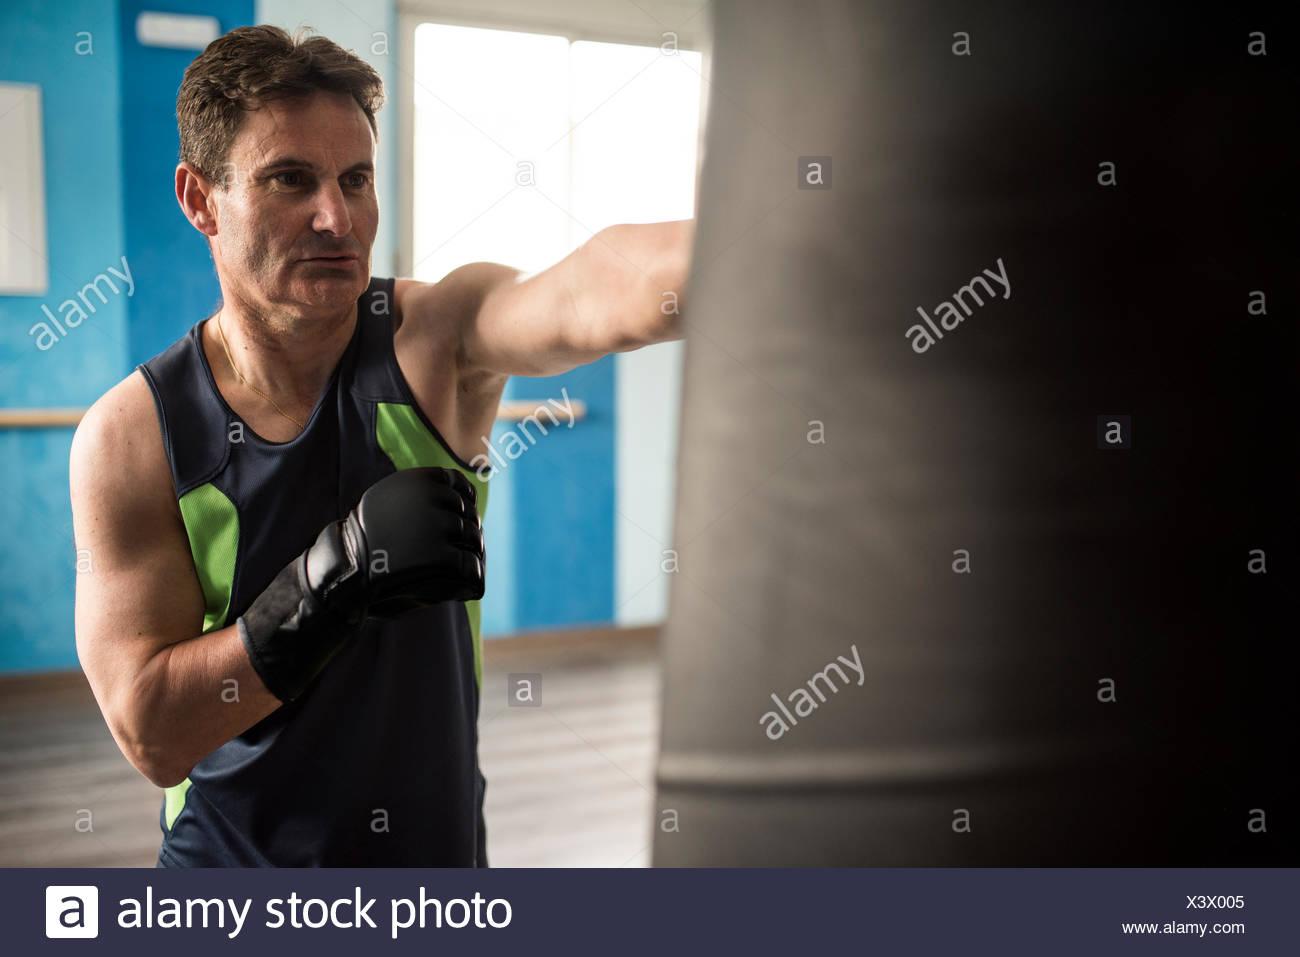 db1e8bf2c03 Senior man boxing in gym Stock Photo  277780613 - Alamy